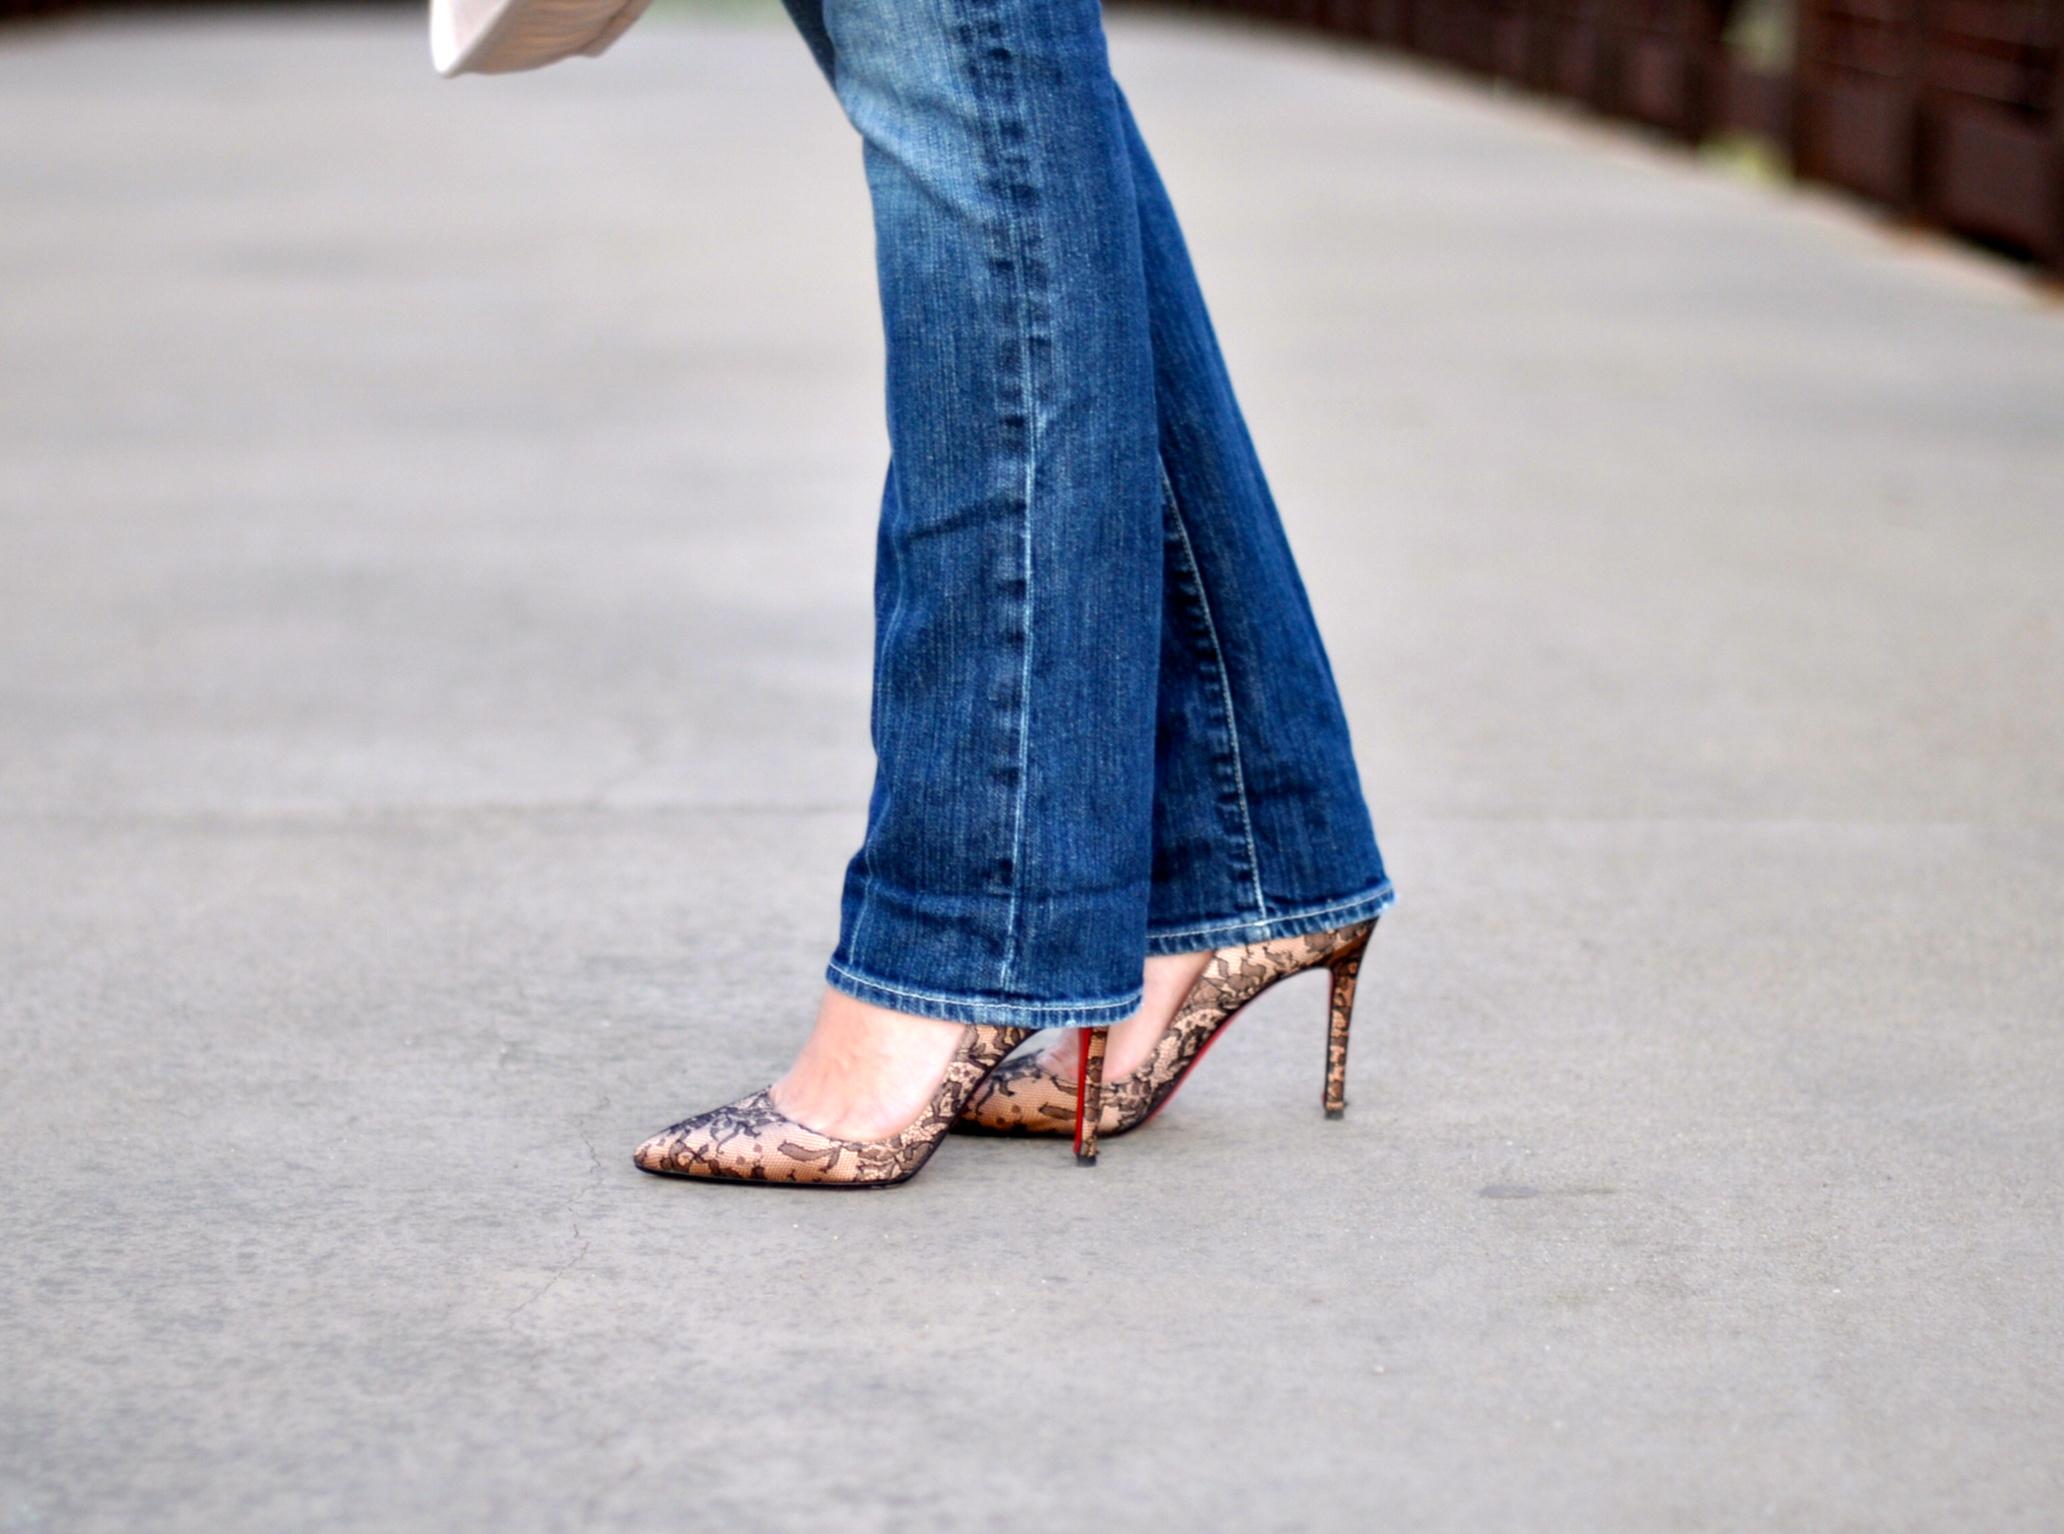 Chanel handbag, Christian louboutin Shoes, forever 21 tank, Moschino sweater, 7 for all mankind jeans, Bottega Veneta Sunglasses, Fashion blogger, Bebe earrings, old navy tutu shirt